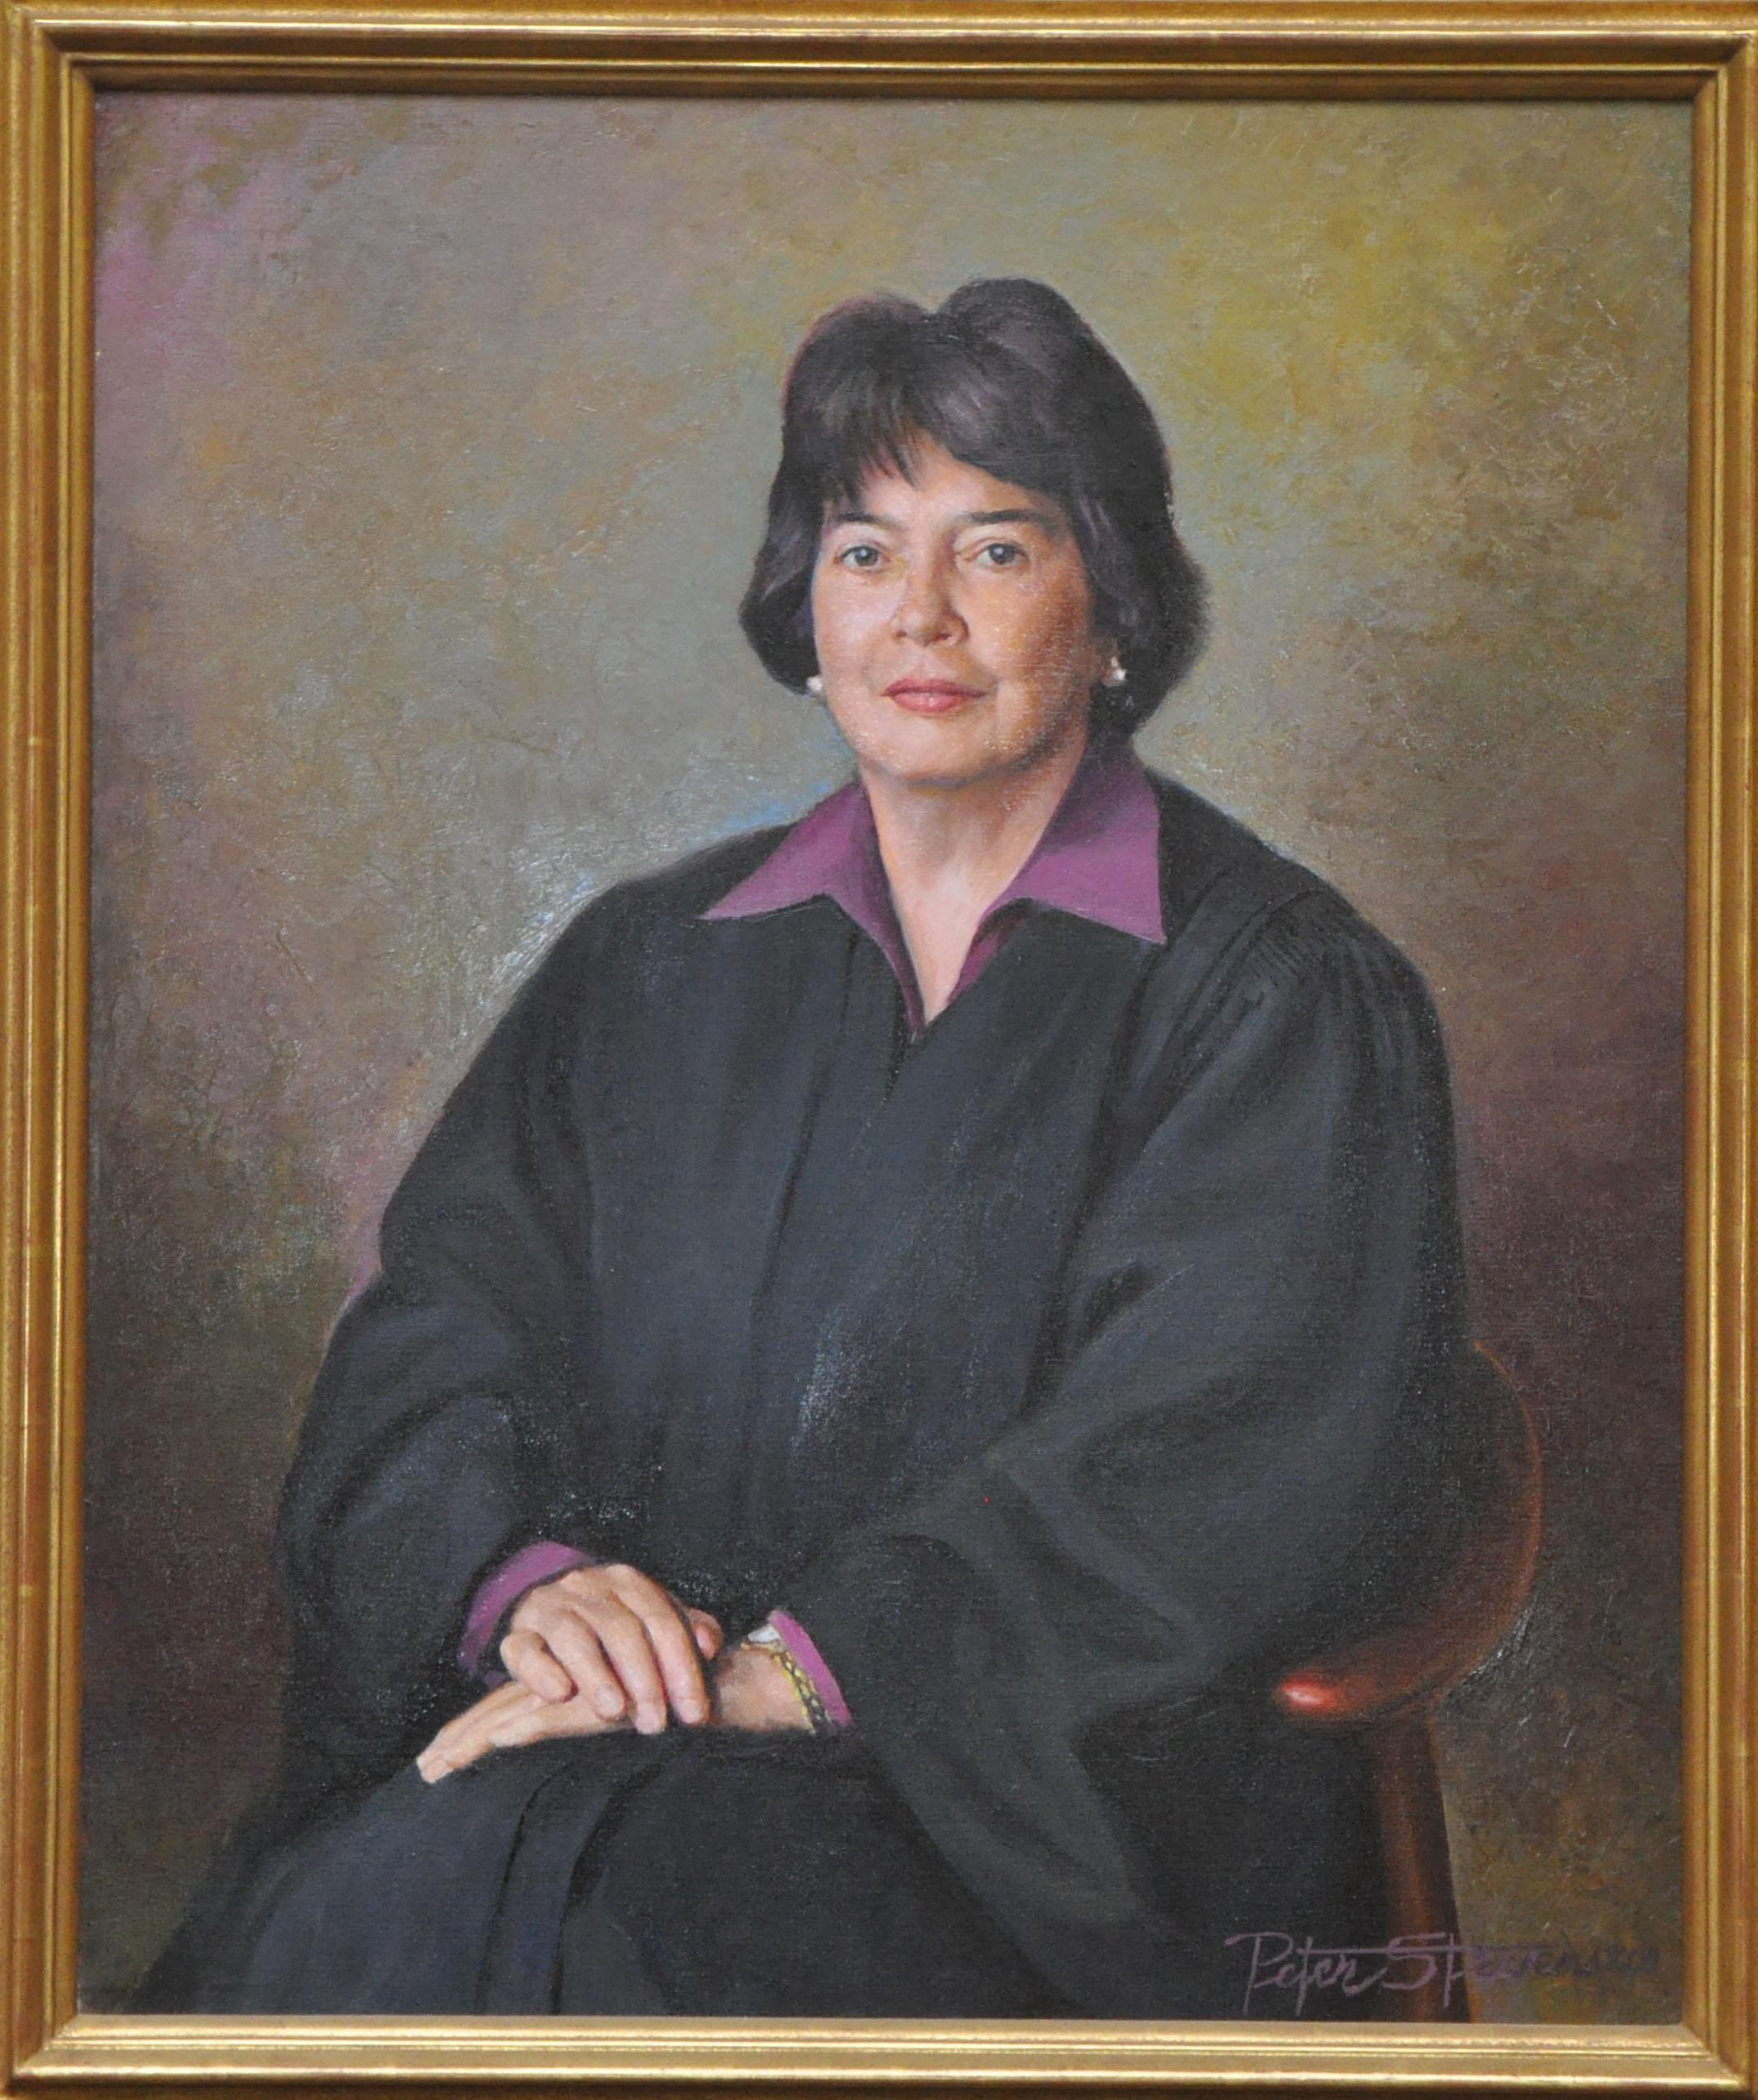 Judge Patricia Wald